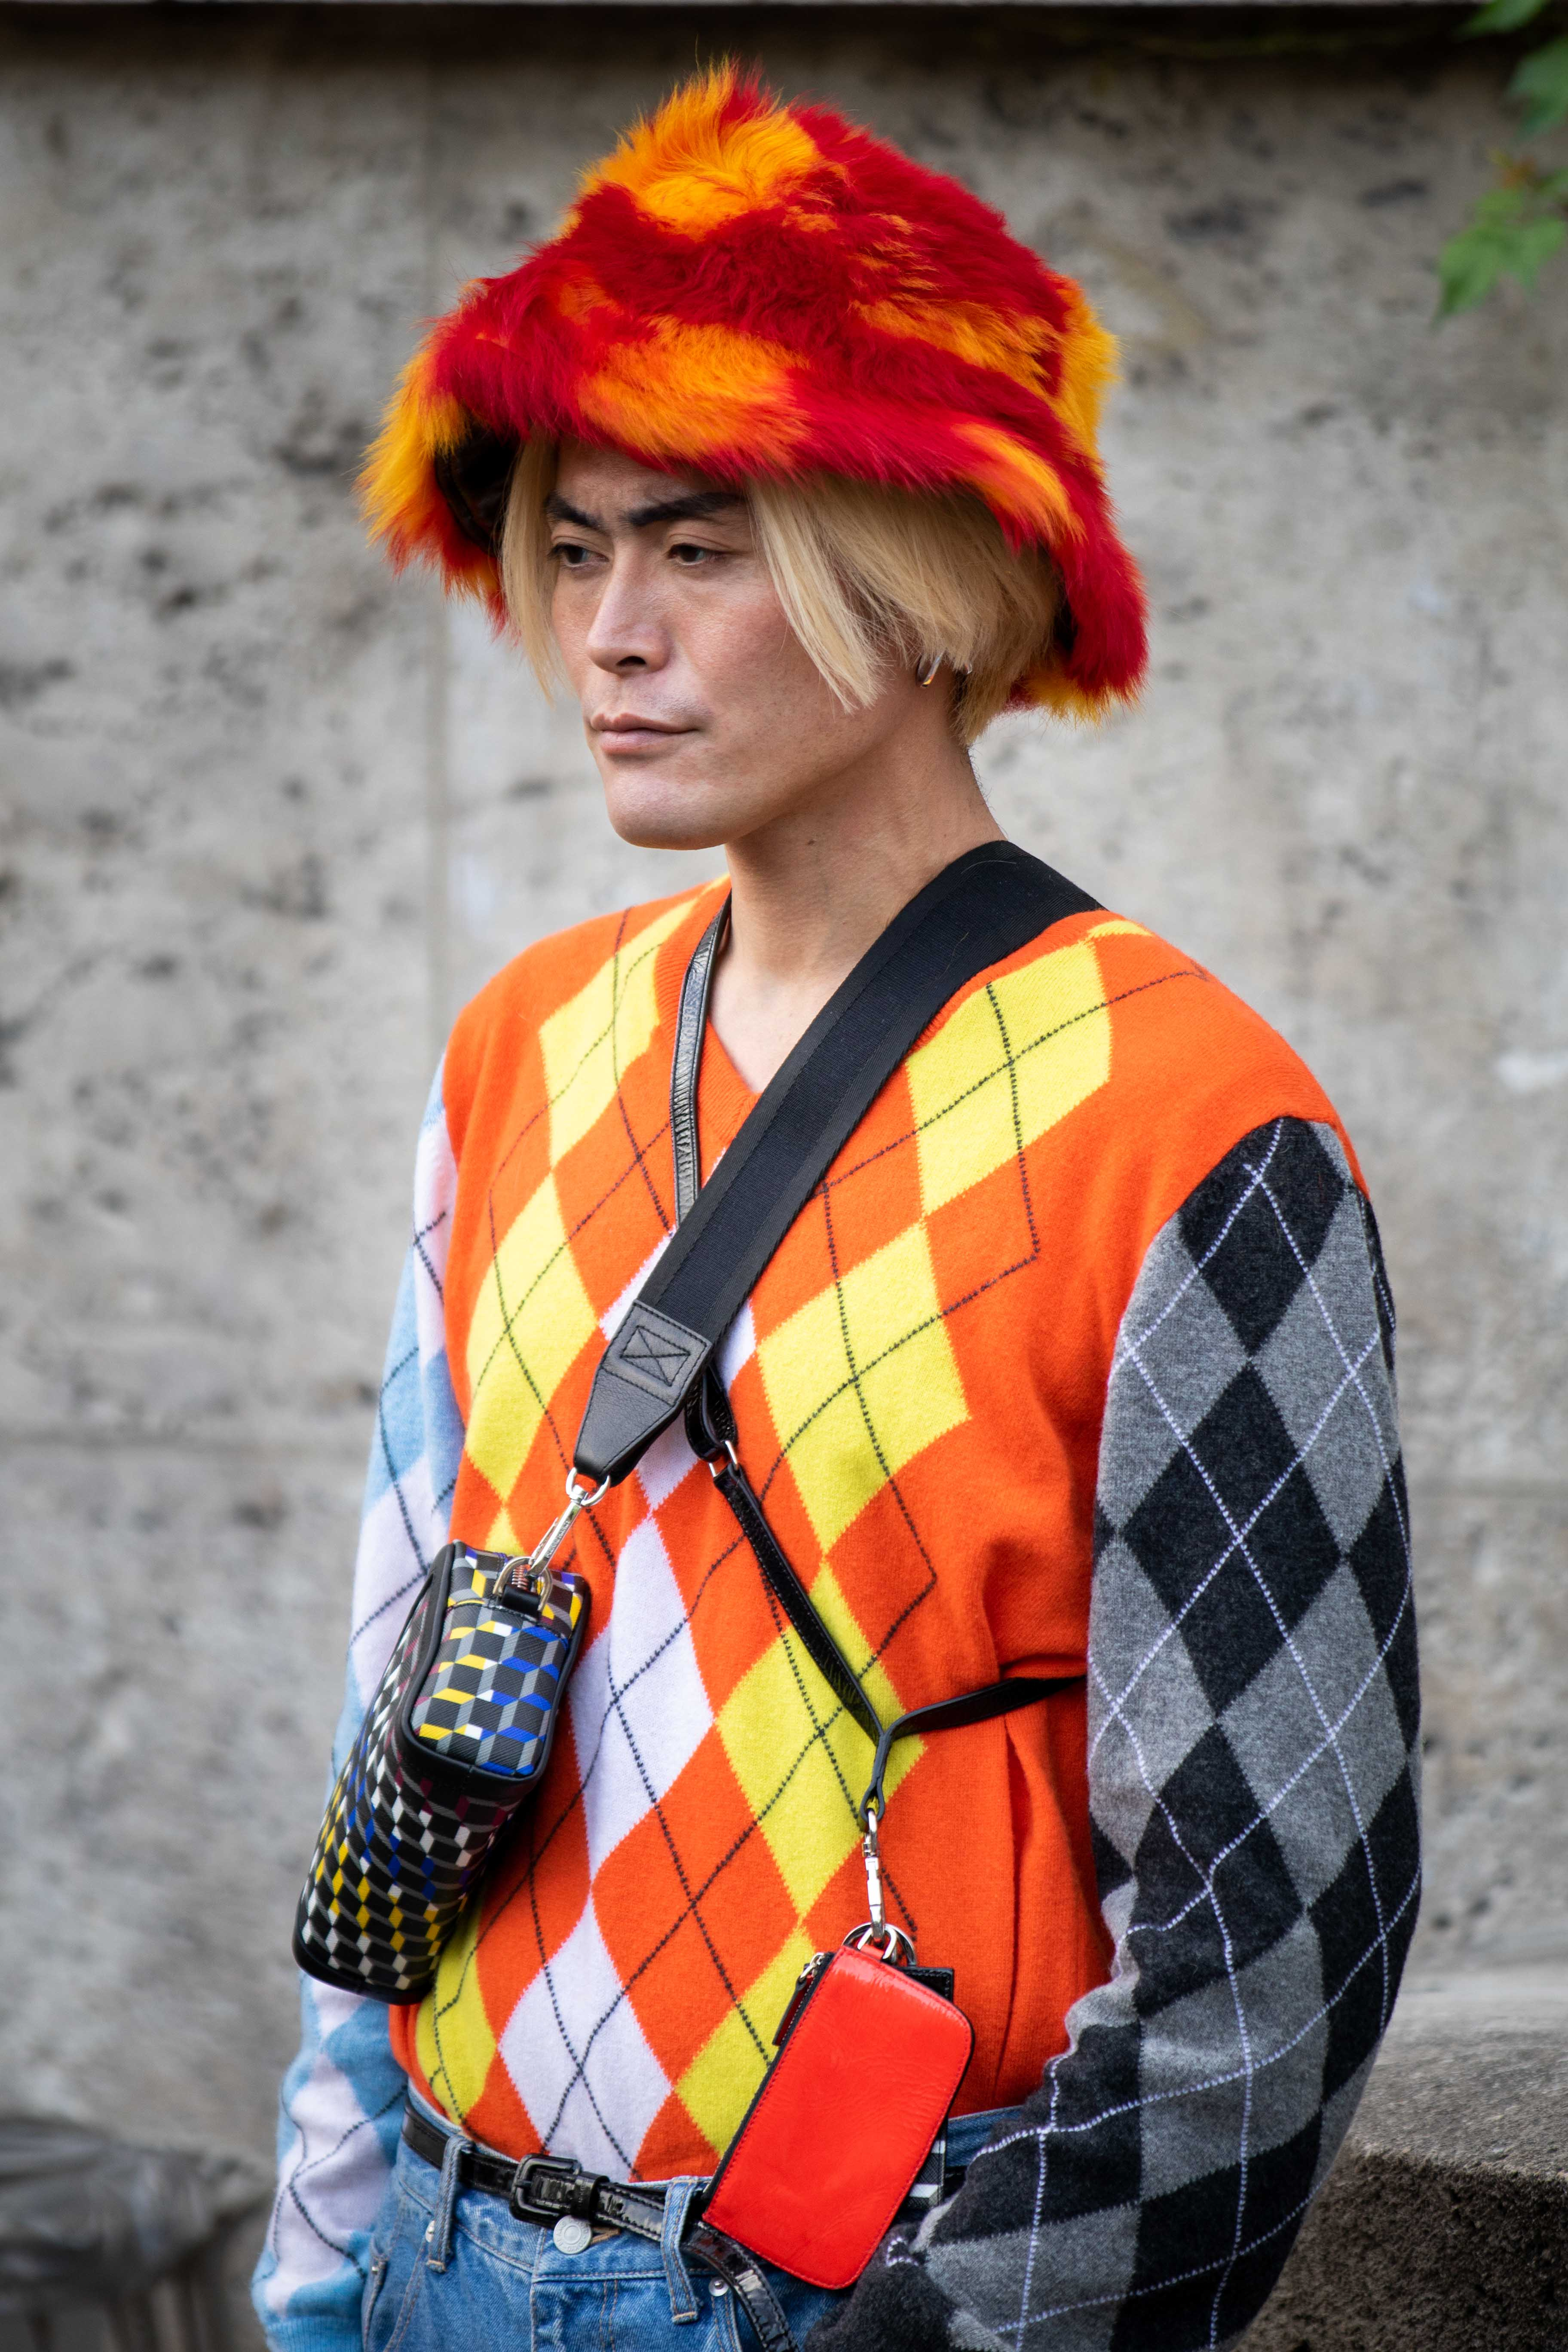 Yu Masui Paris Fashion Week SS20 Nina Ricci Street Style